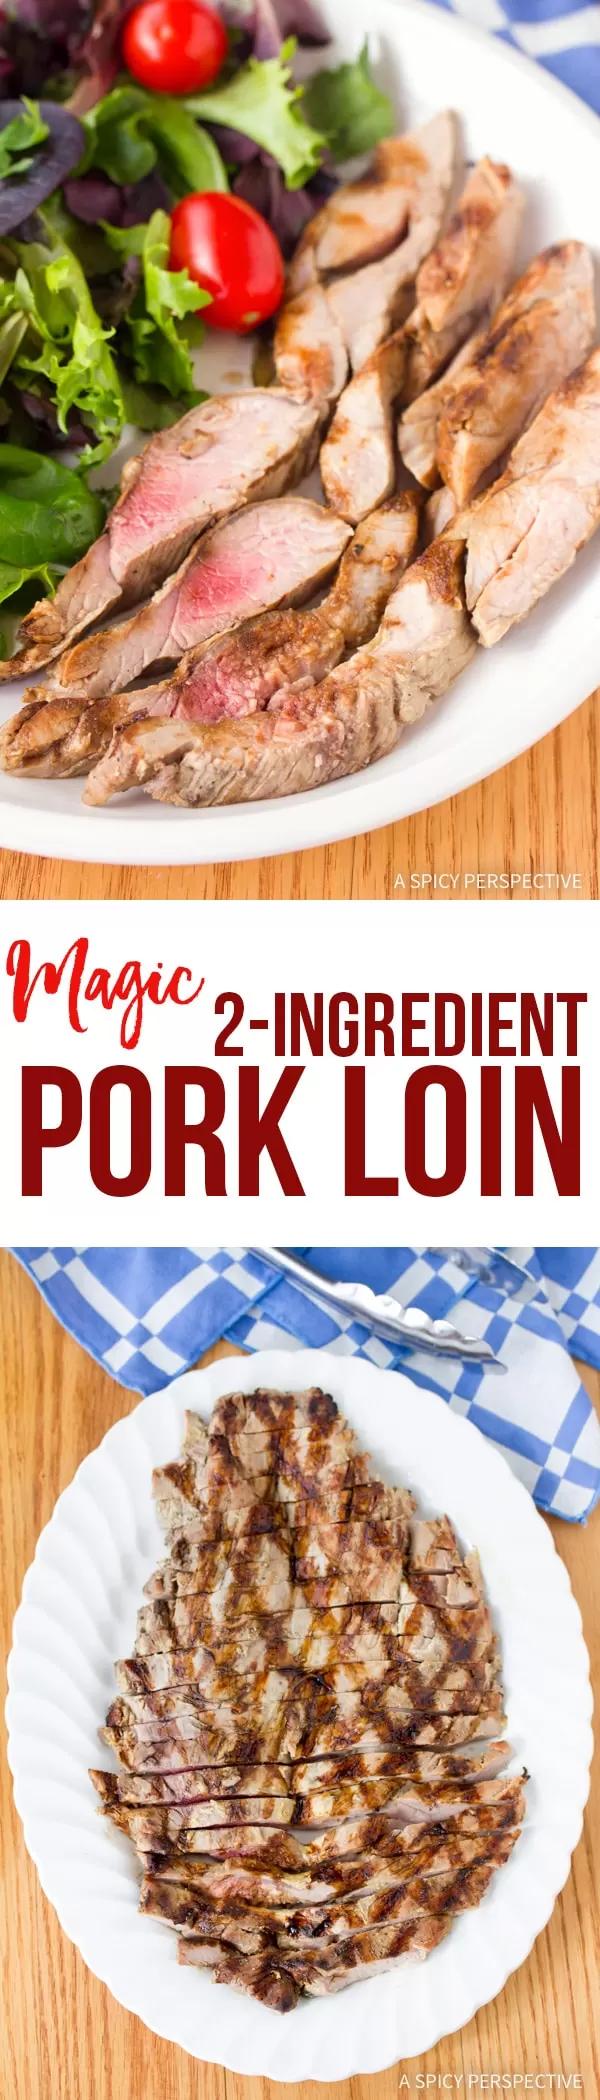 Magic 2-Ingredient Grilled Pork Tenderloin #grilledporksteaks